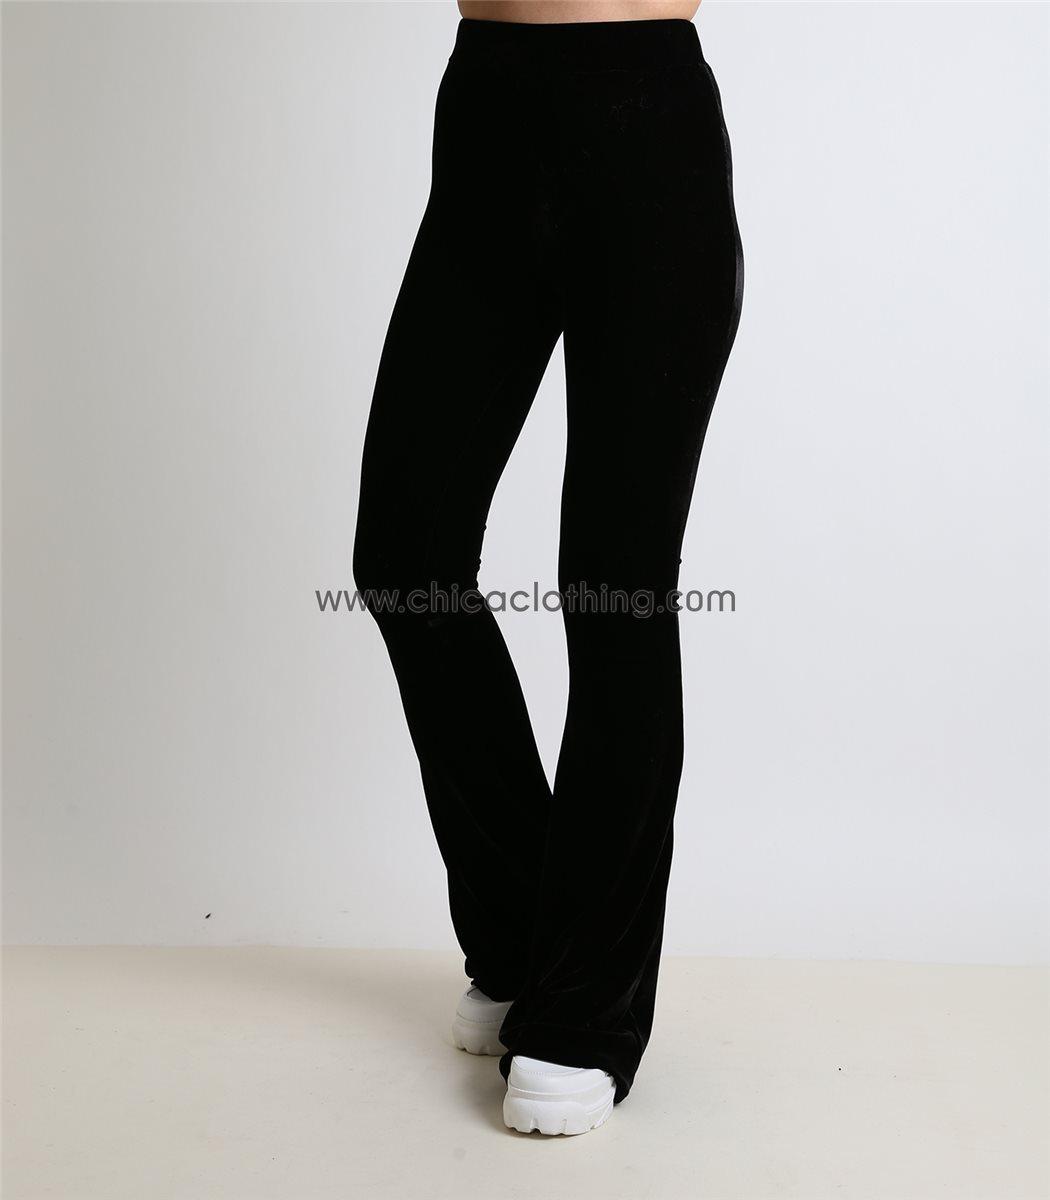 4b32c799eb79 Γυναικεία μαύρη βελούδινη ελαστική παντελόνα ψηλόμεση καμπάνα